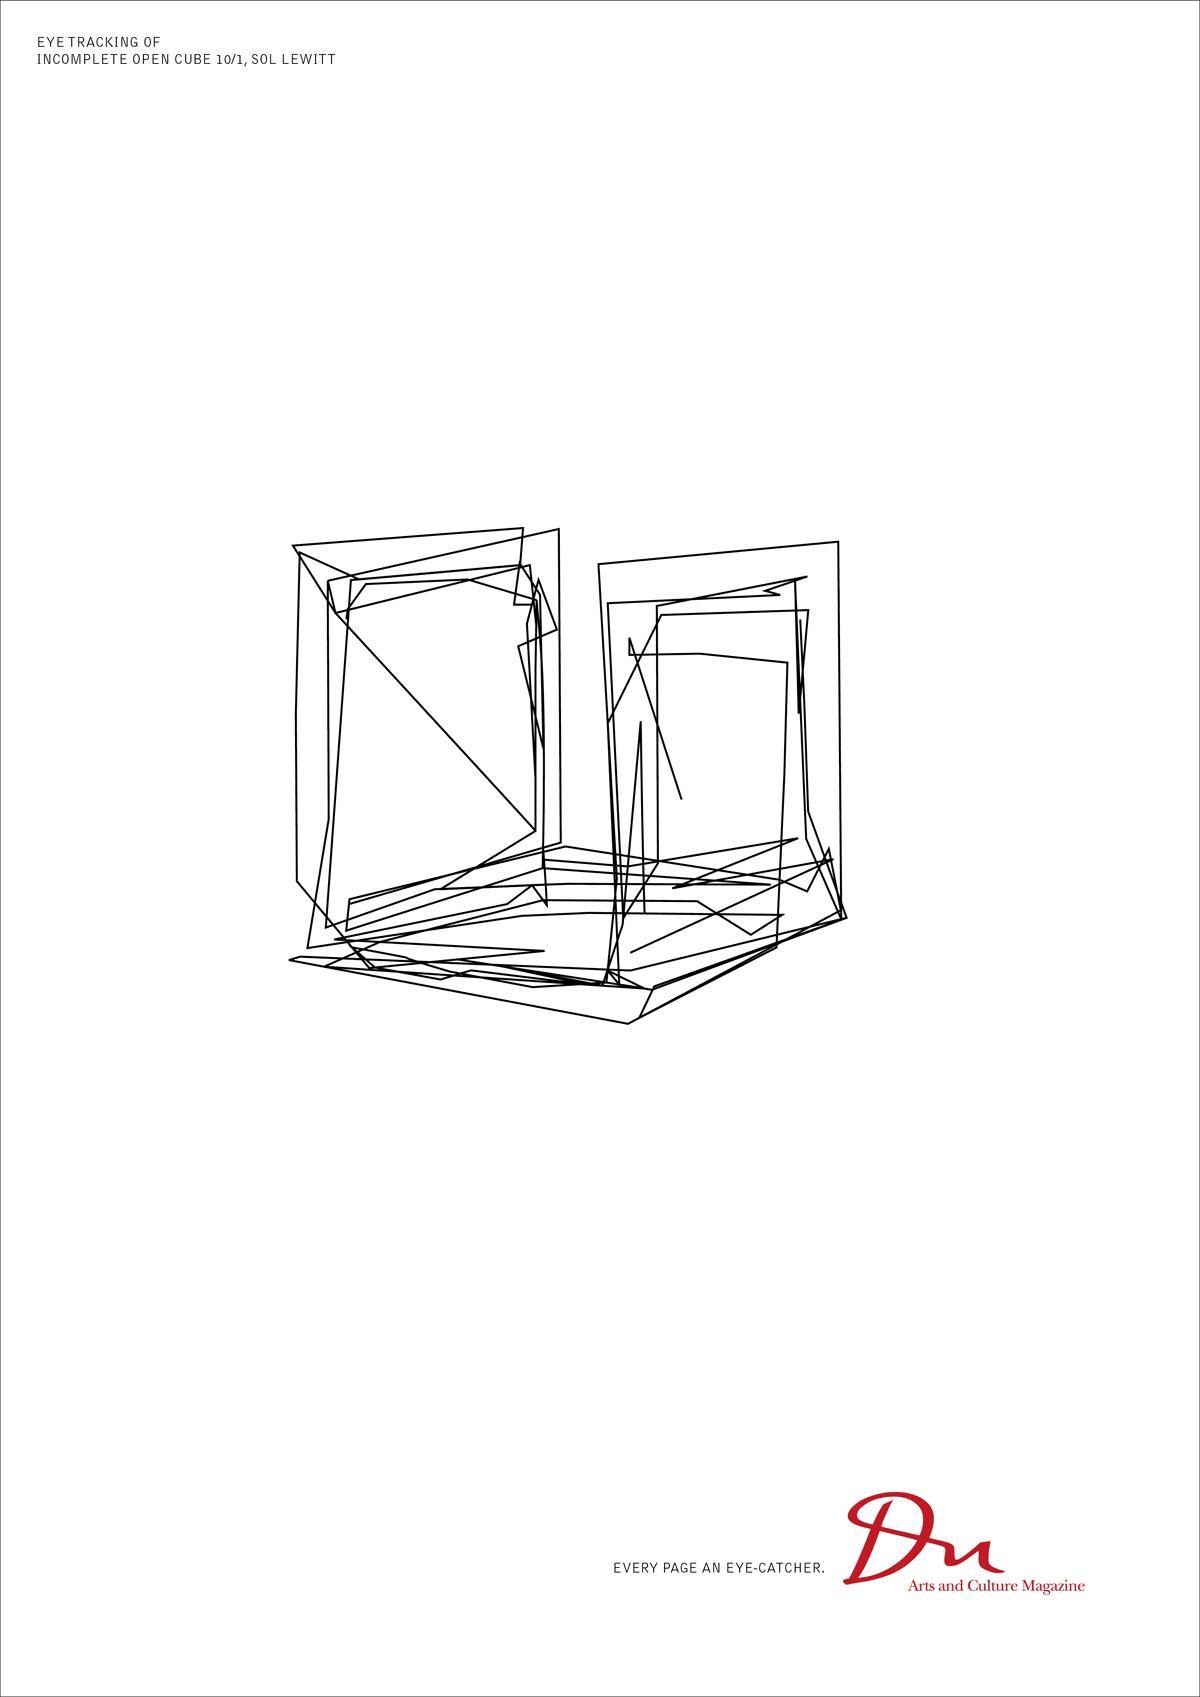 DU Kulturmagazin Print Ad -  Eye tracking Sol Lewitt